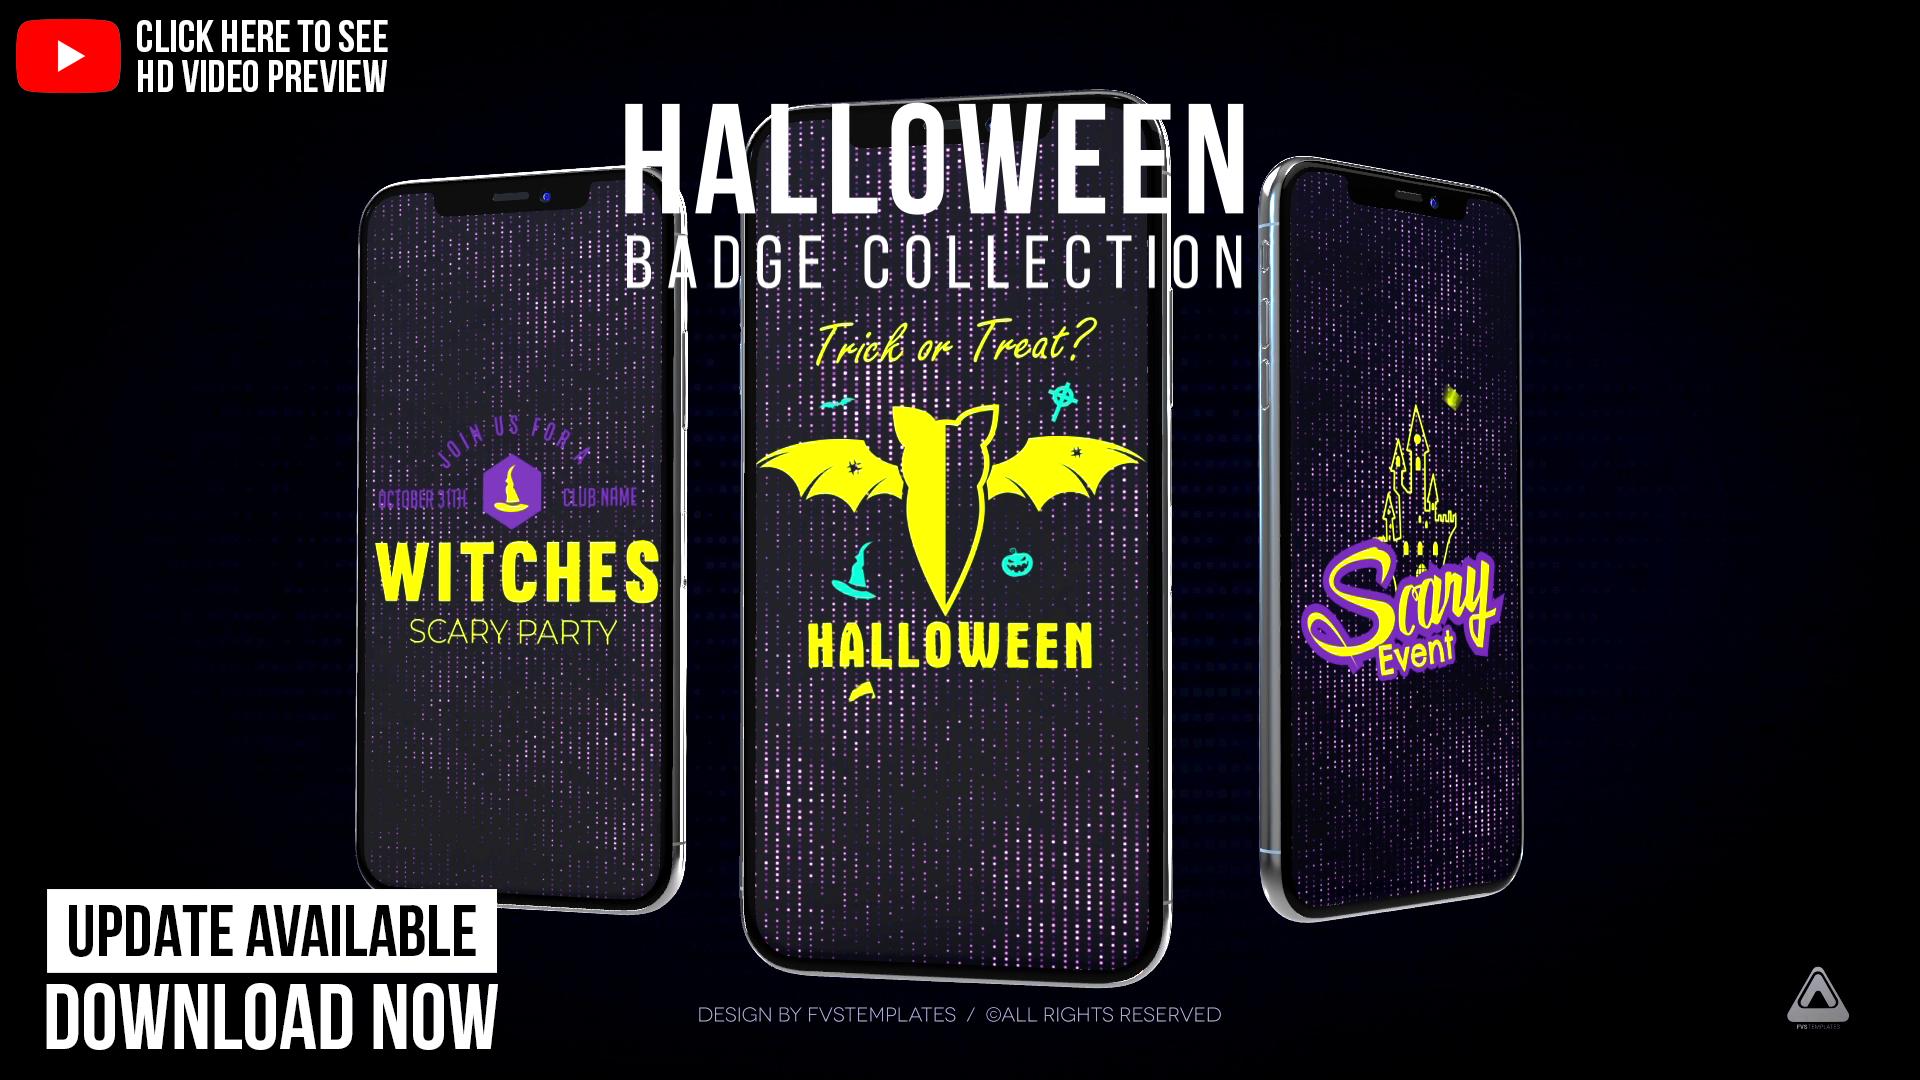 Halloween IGTV / Halloween Badge Collection Pack_2018